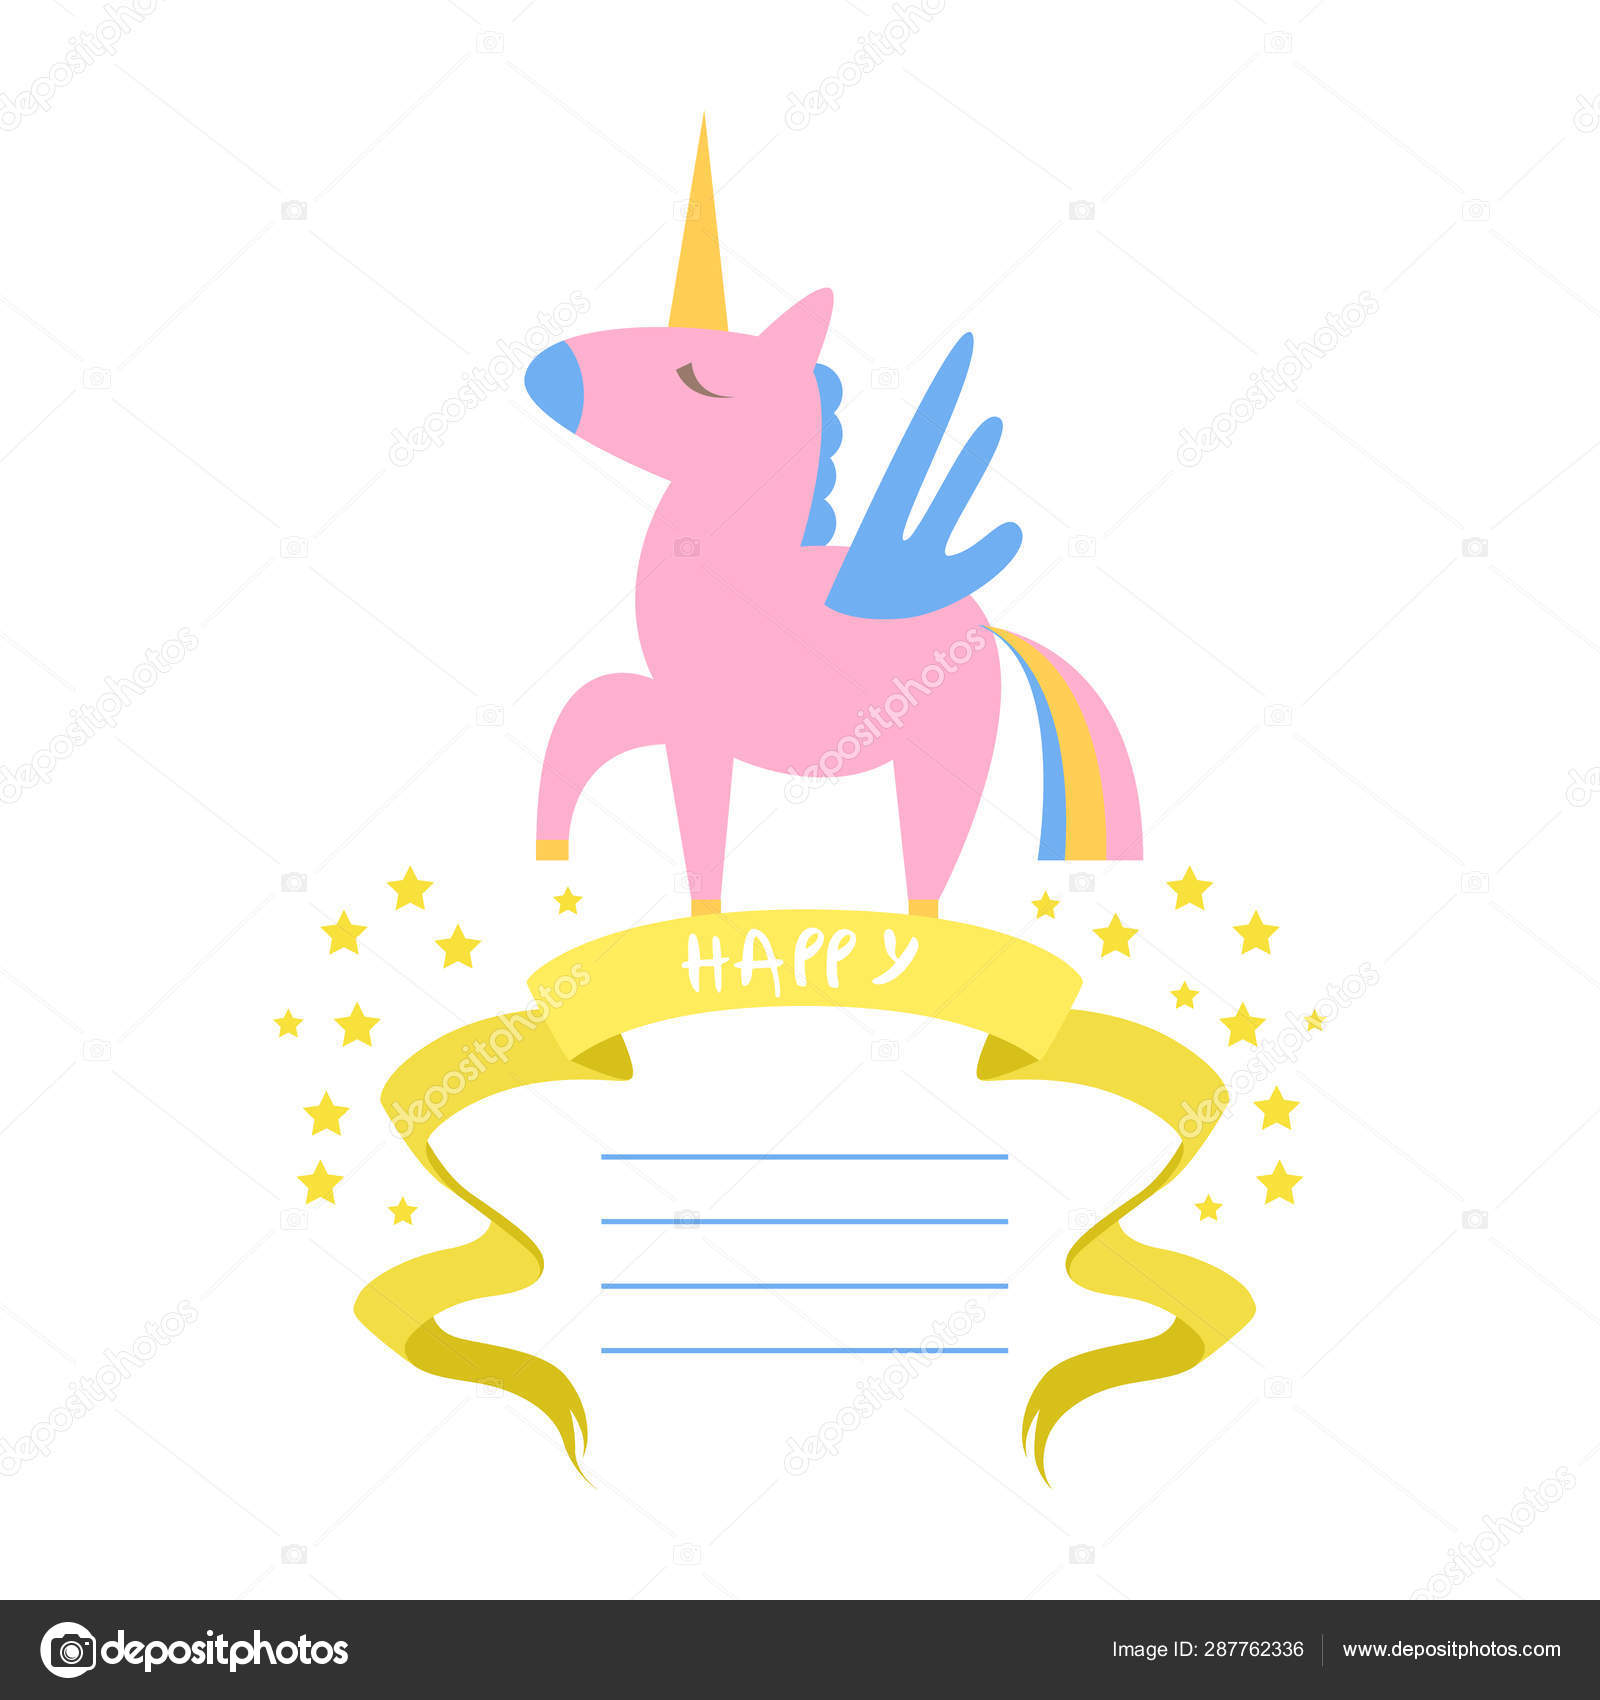 Hermosa Plantilla De Tarjeta De Unicornio Con Lugar Para